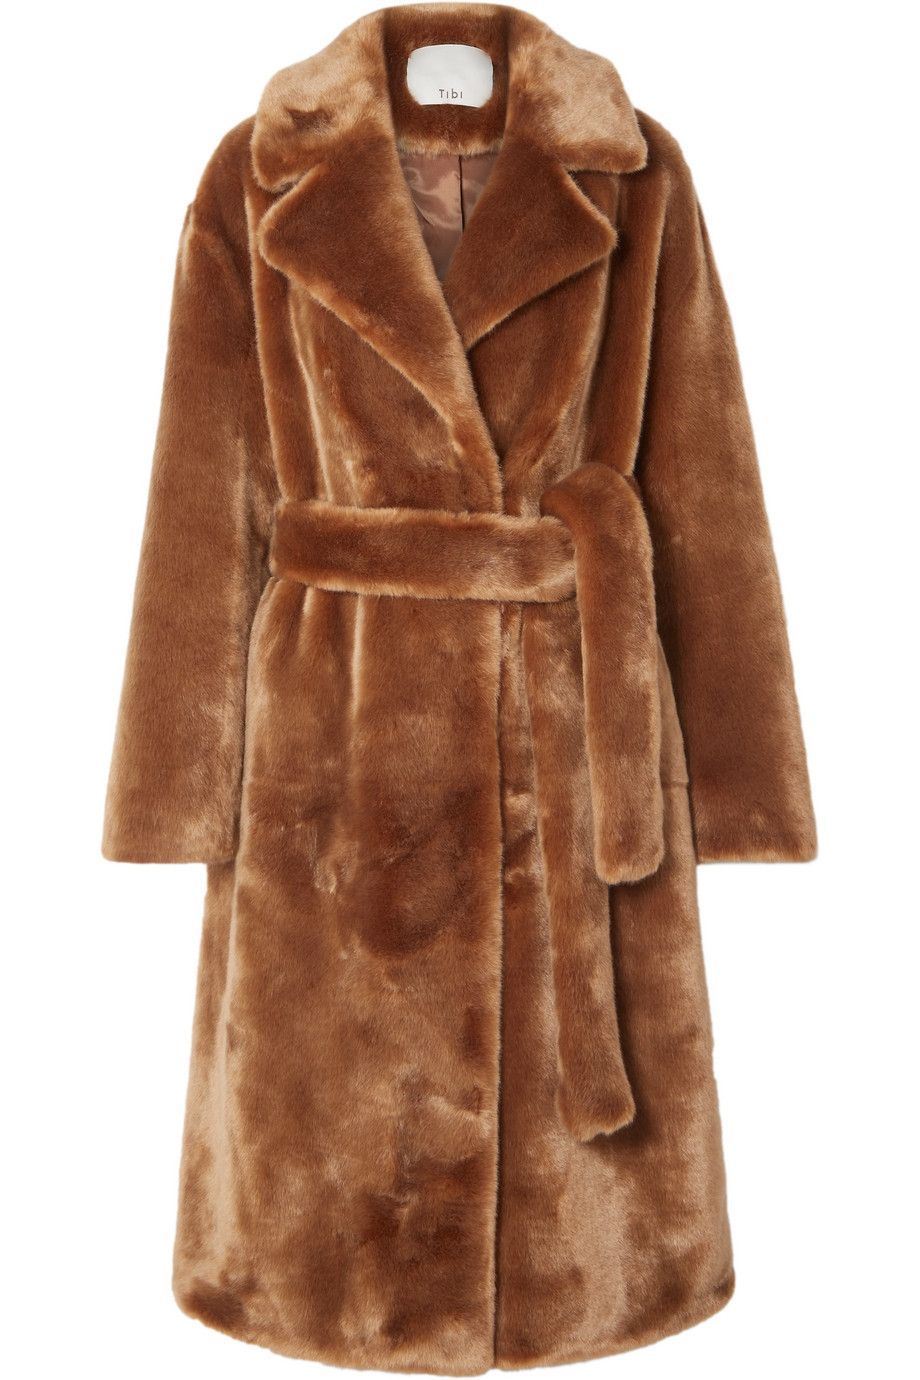 41e3297fce 20 Best Faux Fur Jackets For Women 2018 - Fake Fur Coats for Winter